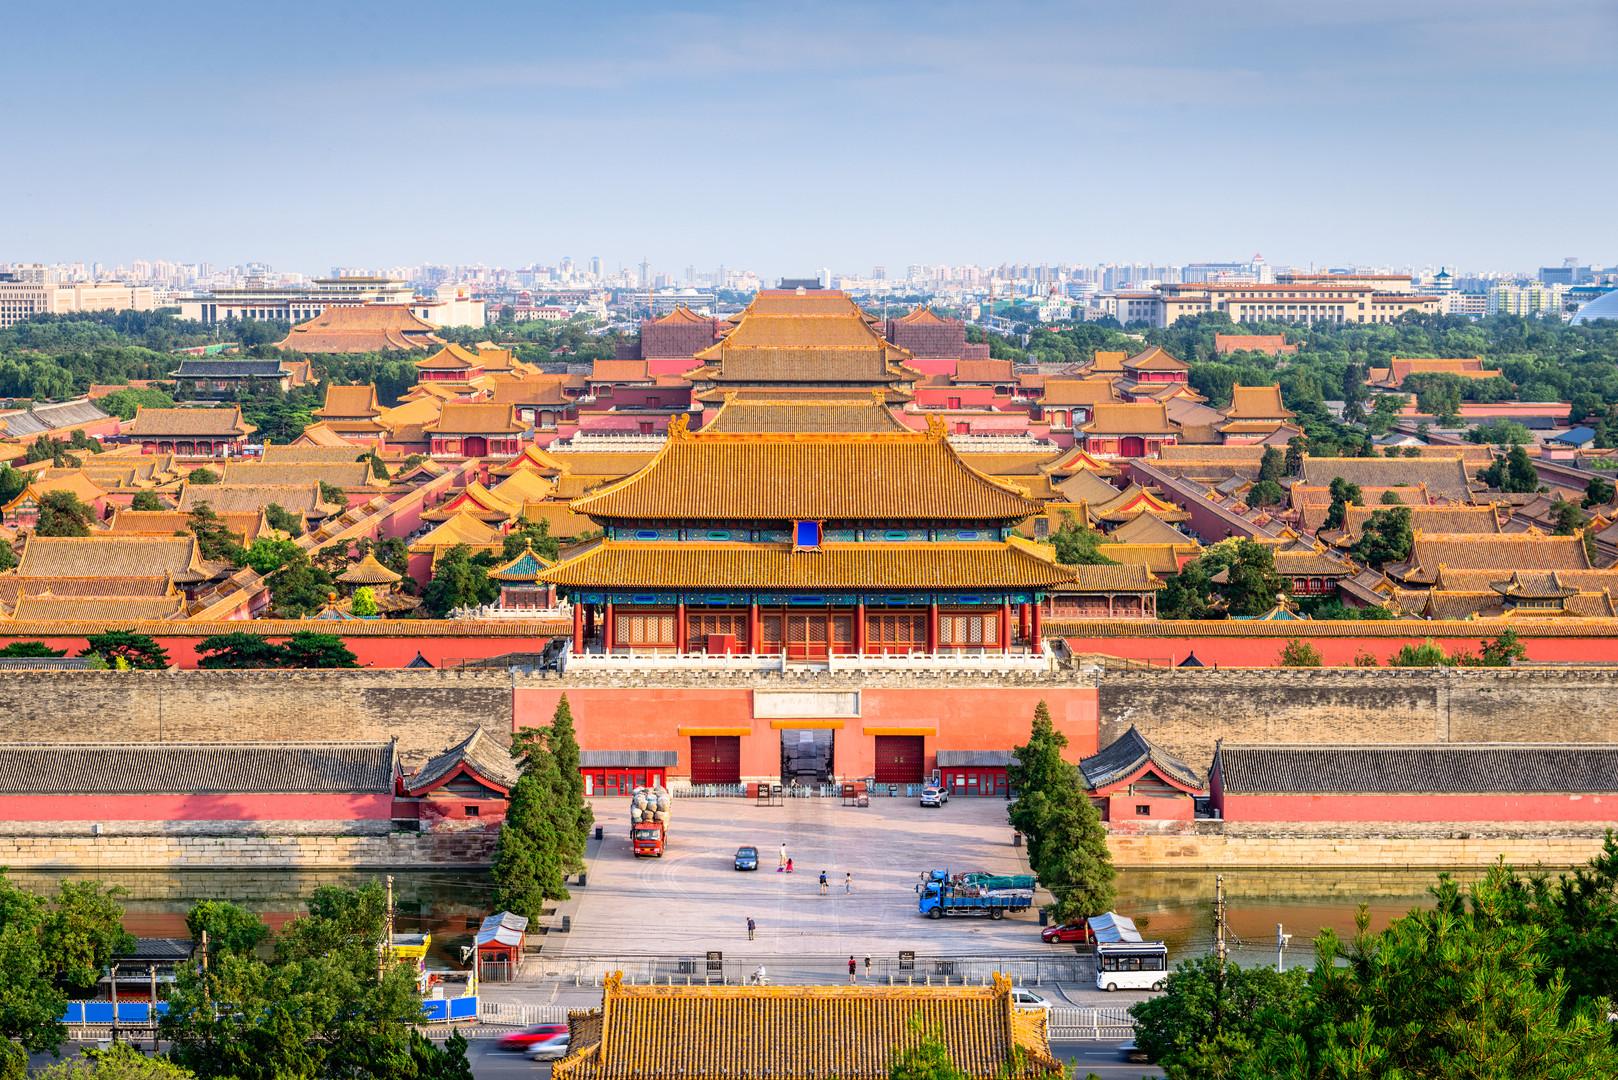 beijing-china-forbidden-city-P9HJVW8.jpg